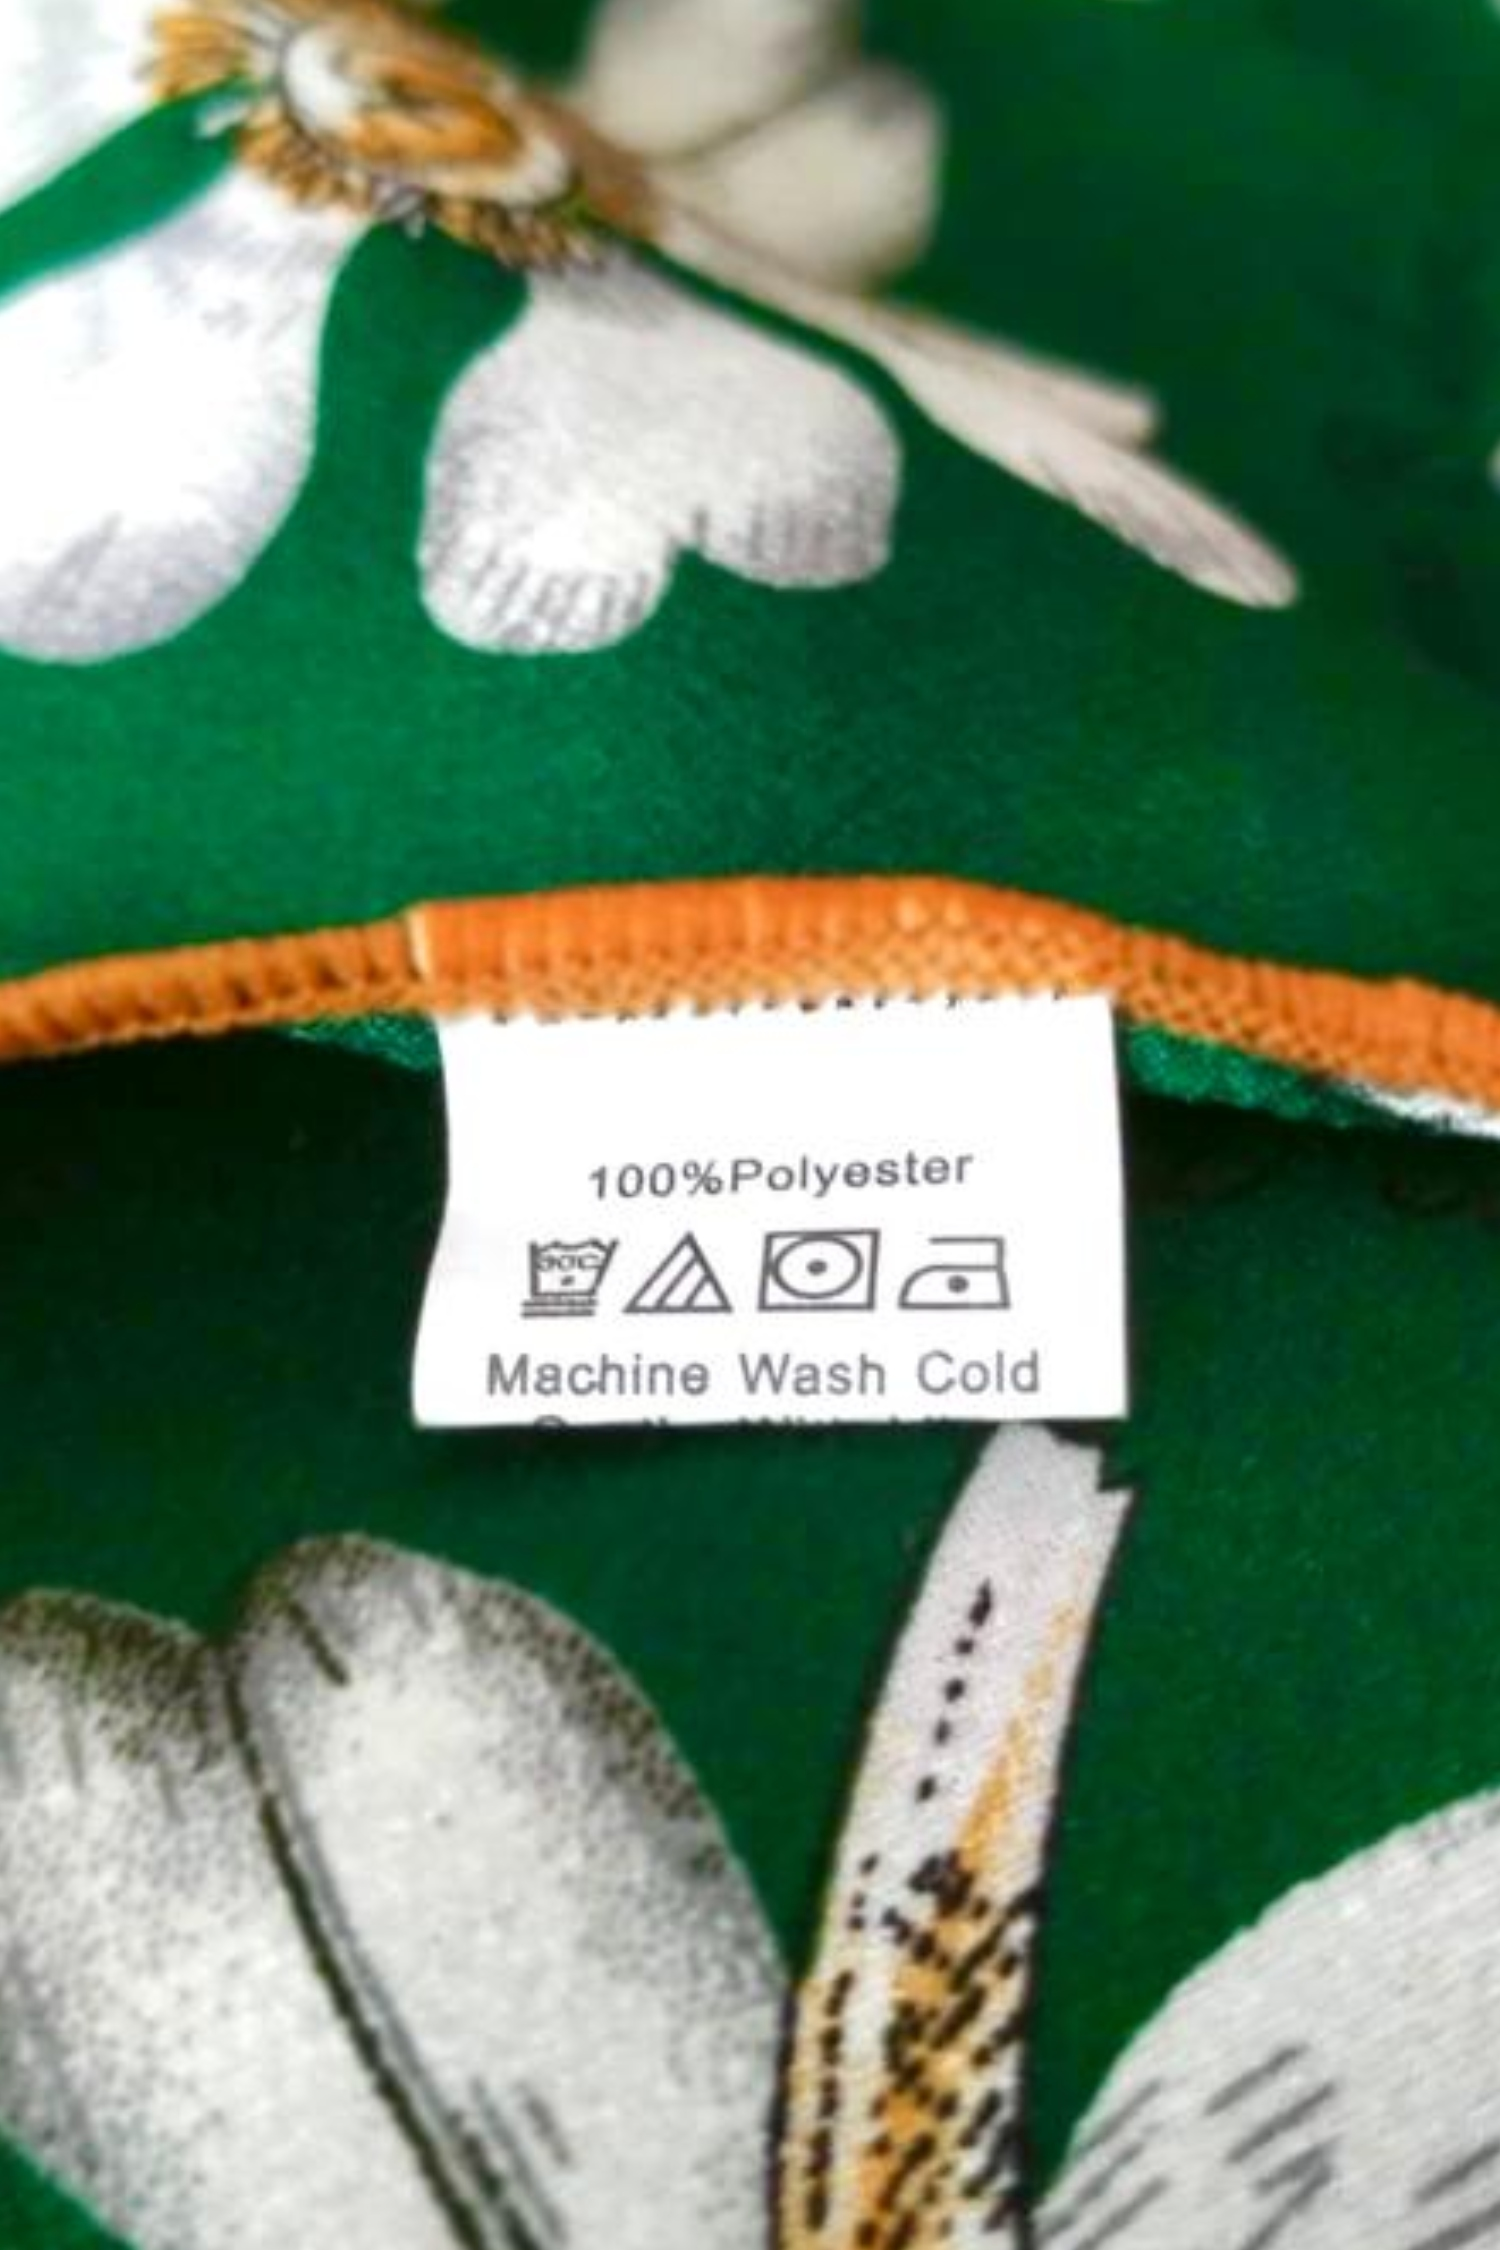 Tipos de tejidos: polyester, ¿sí o no?